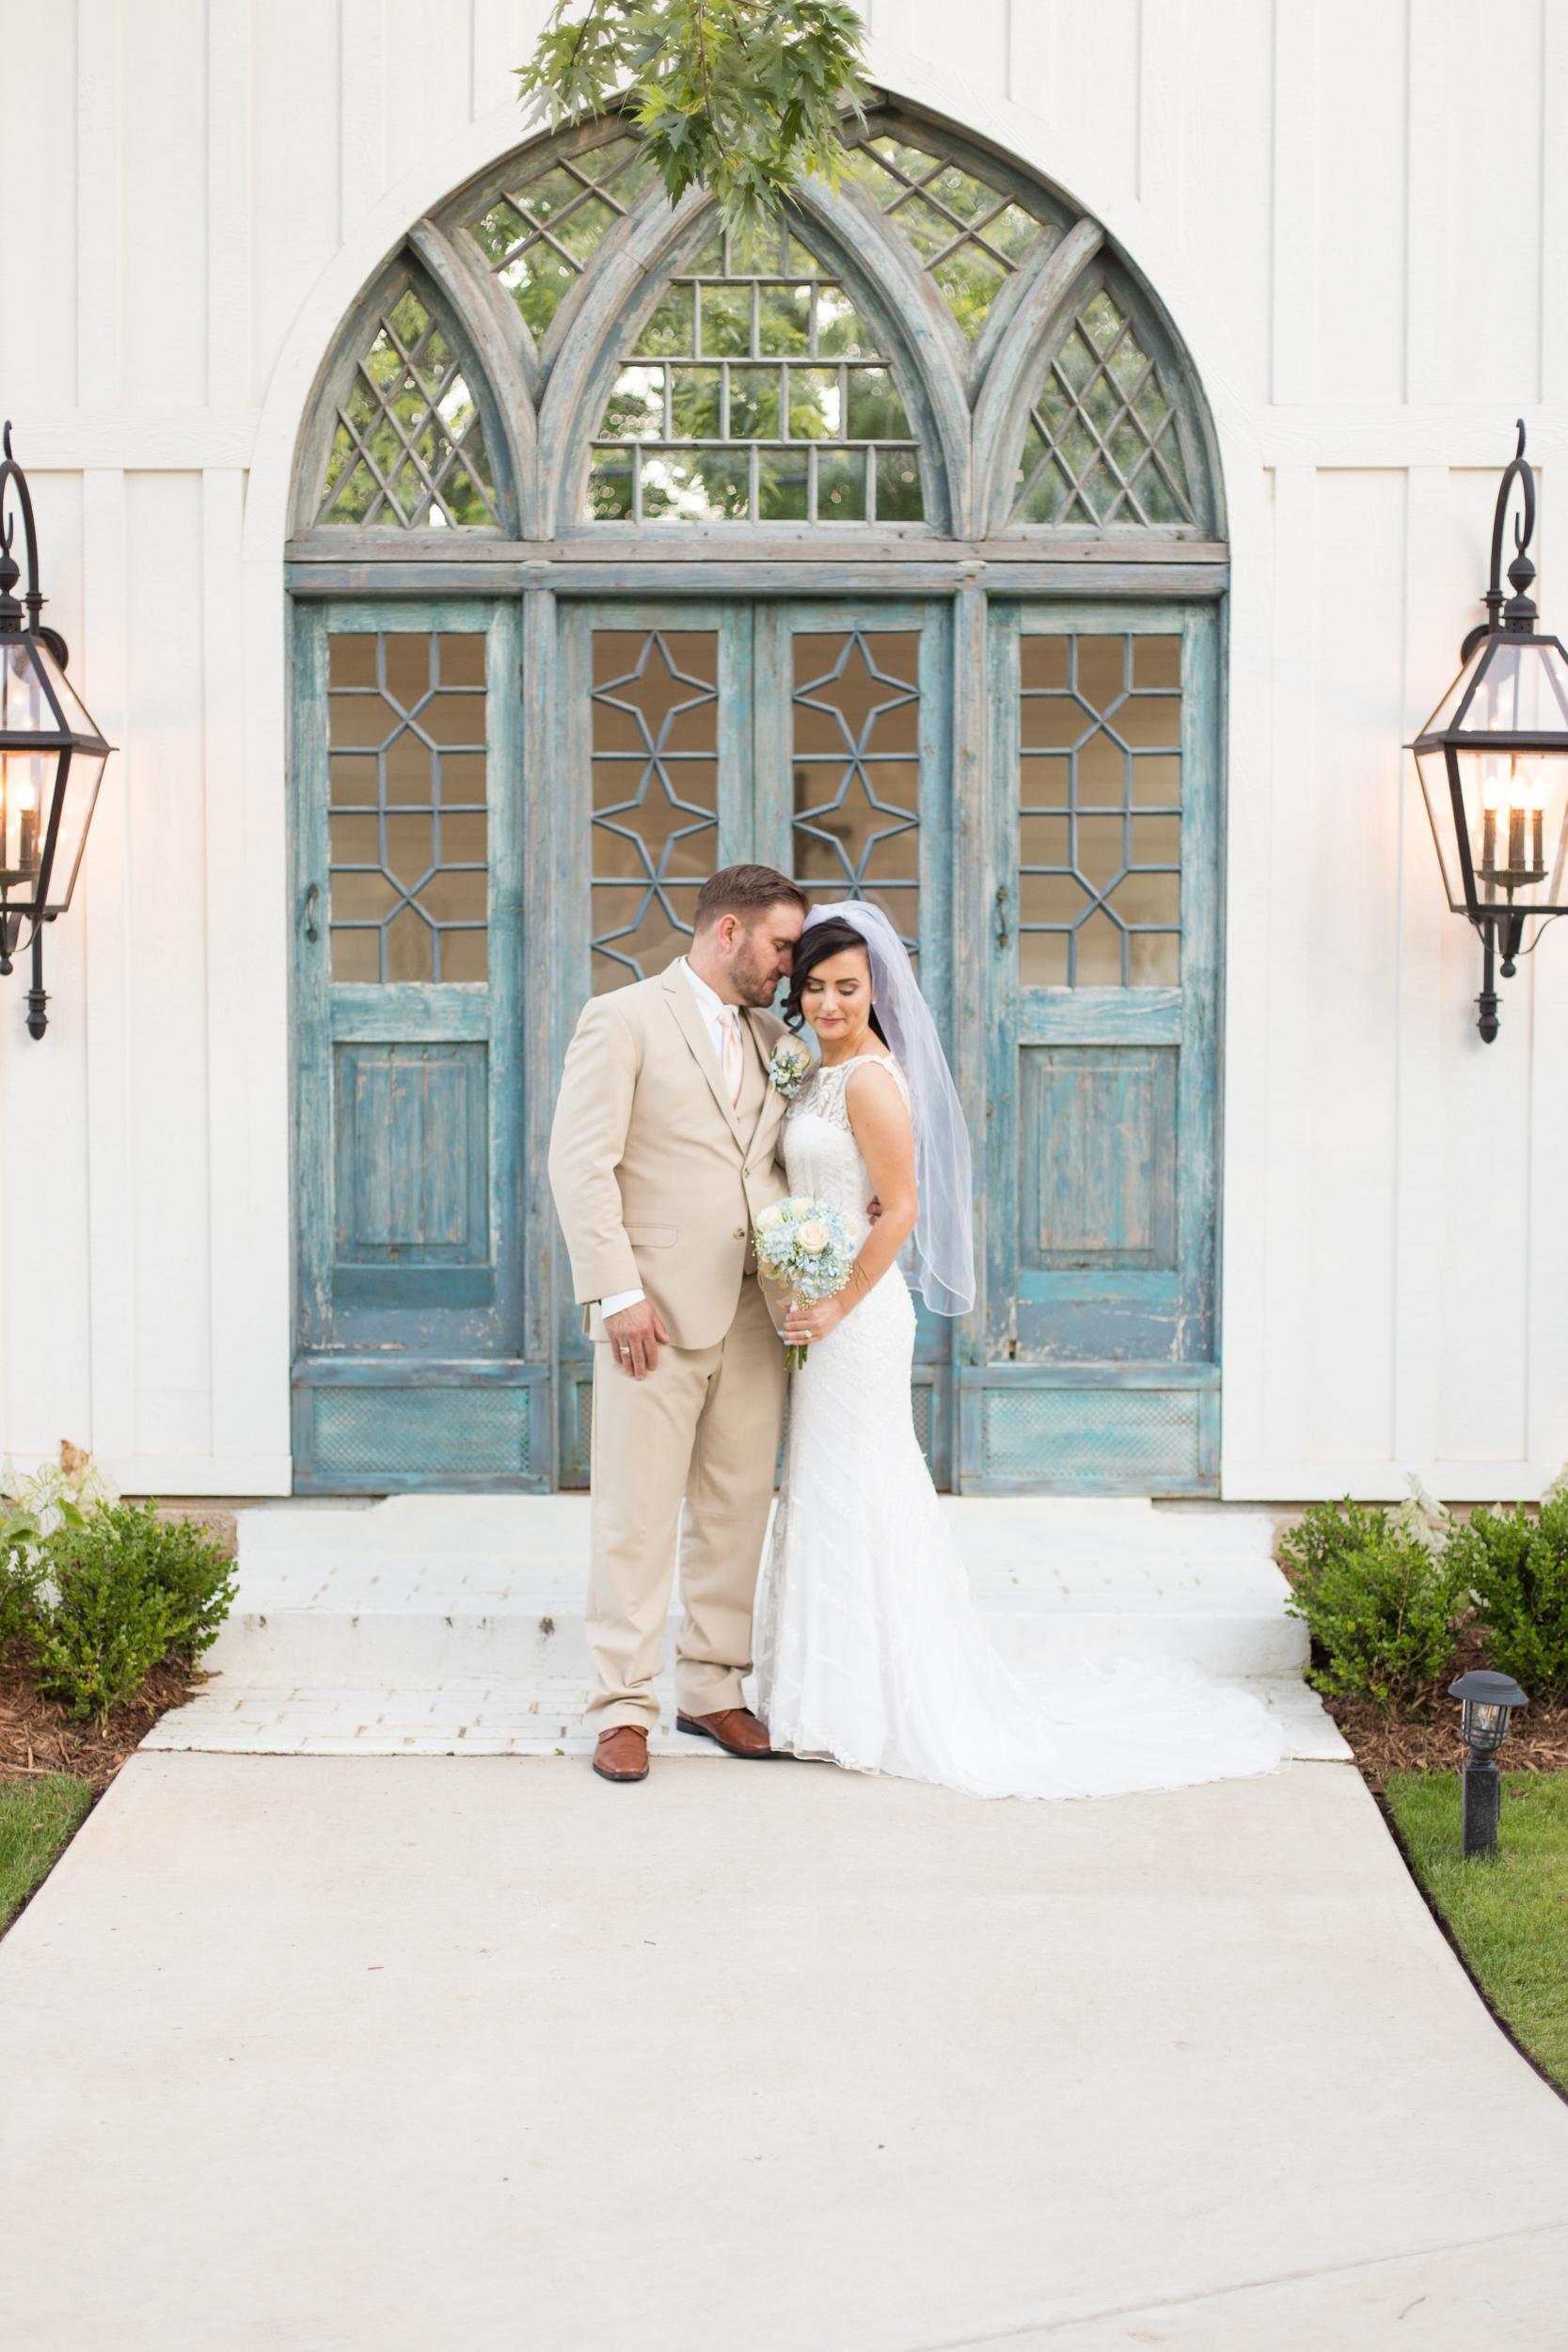 Zihlman-East TX Wedding_Kelsie Hendricks Photography_The Folmar Tyler Texas-117.jpg